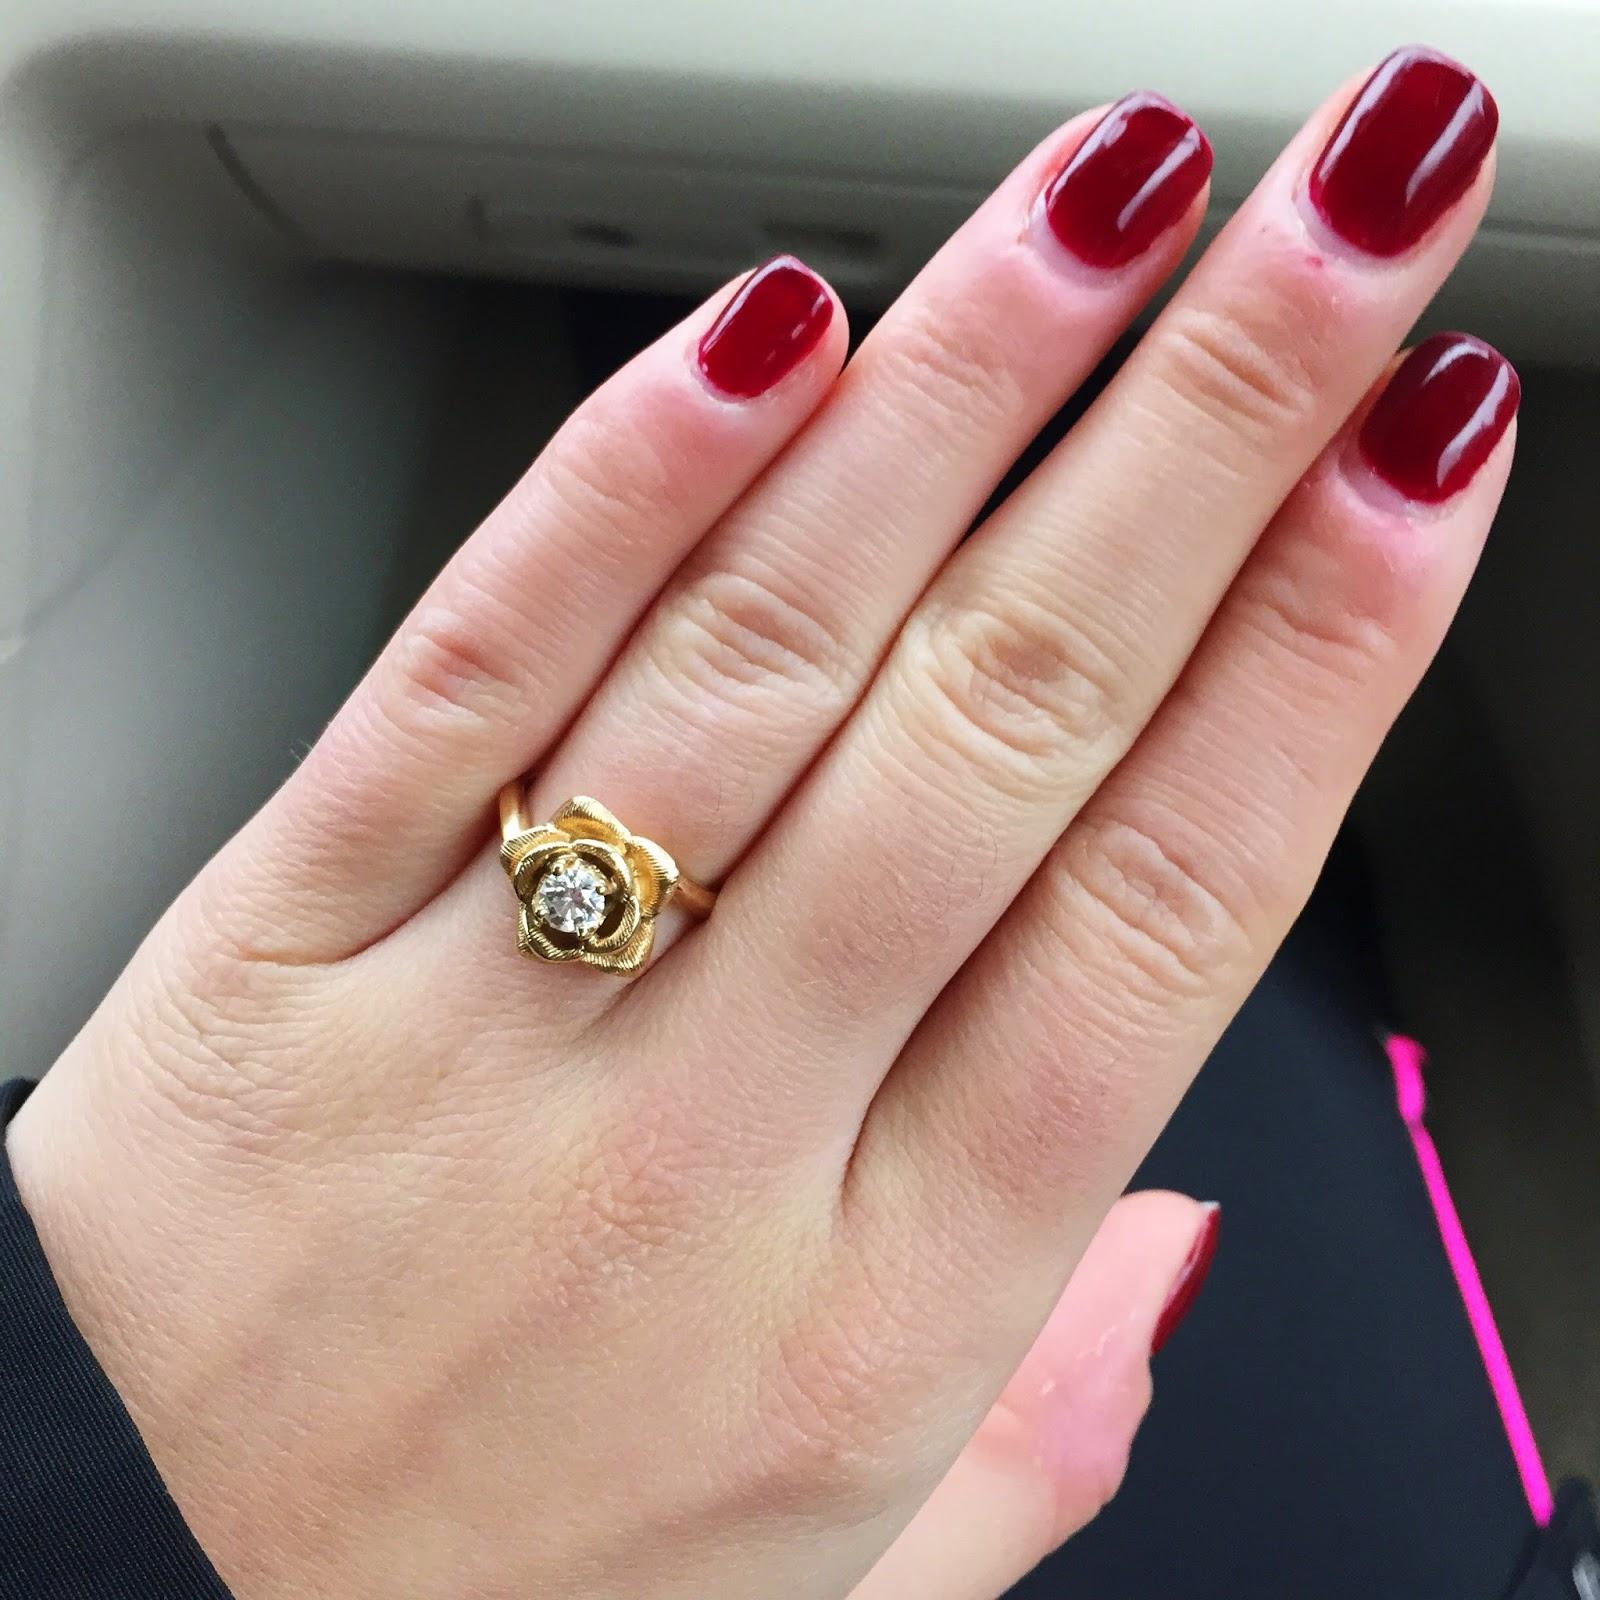 Summer Wind: My Everyday Jewelry